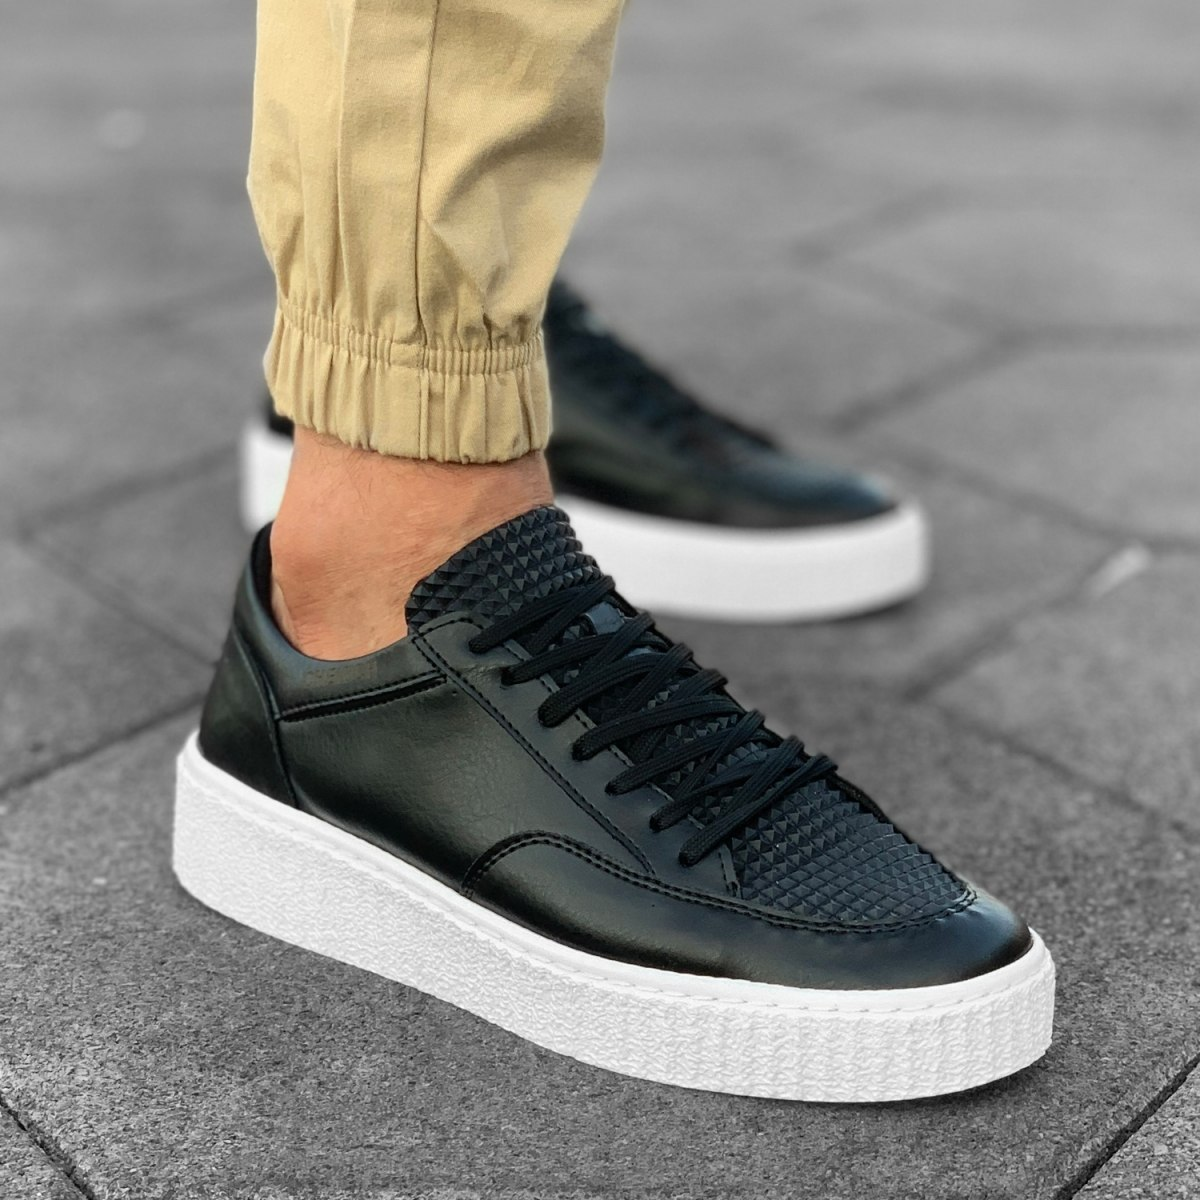 Herren Street-Pump Sneakers in Schwarz-Weiß Mv Premium Brand - 1